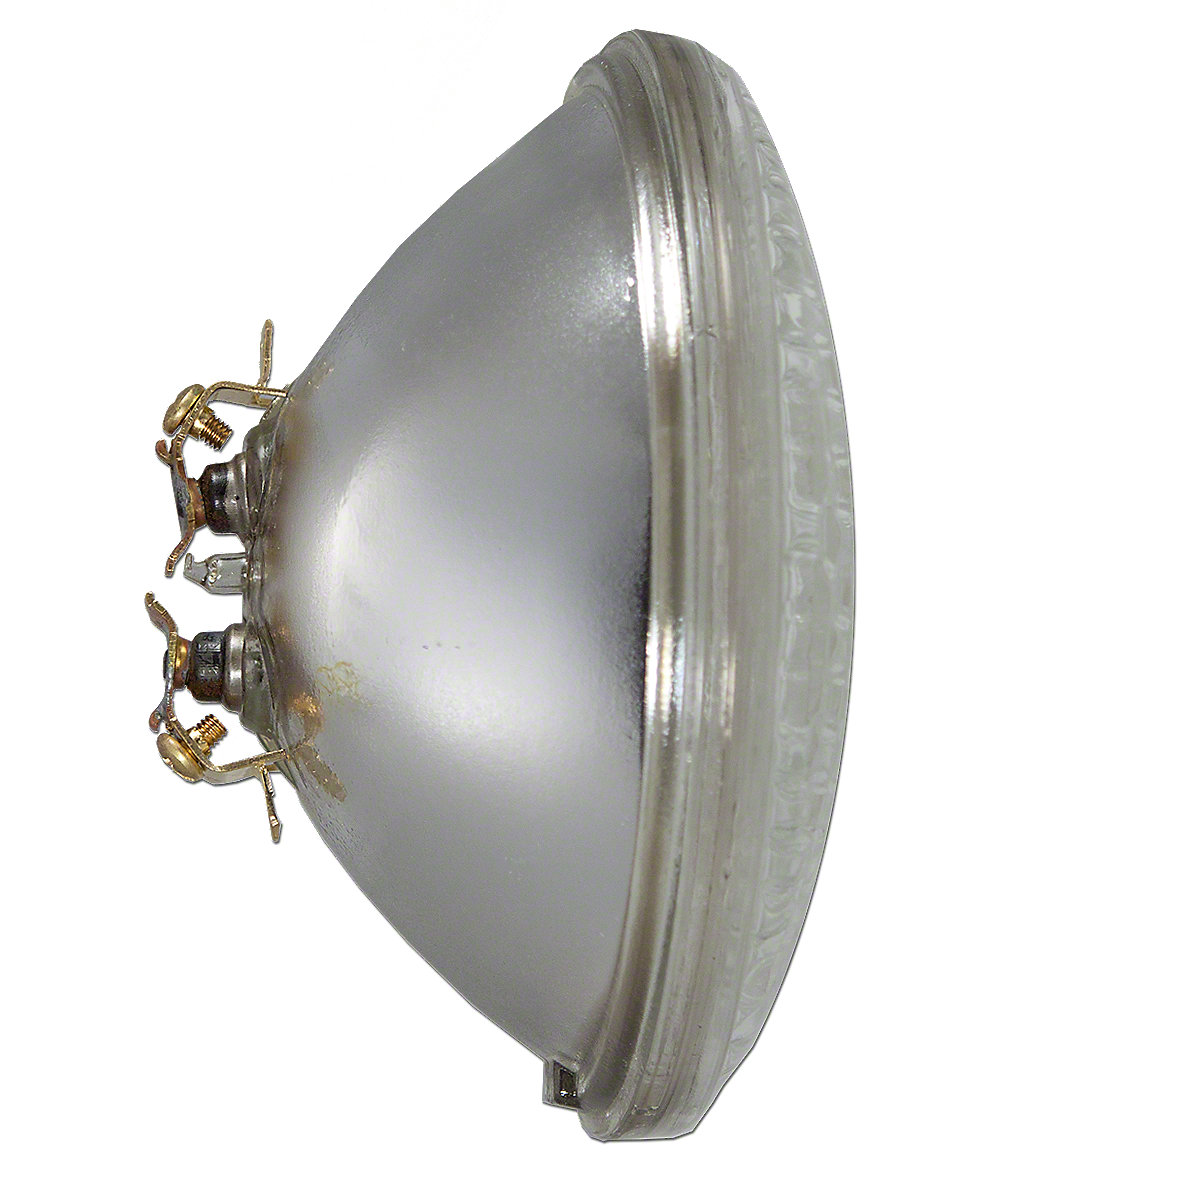 ABC443Sealed Beam Bulb 12V